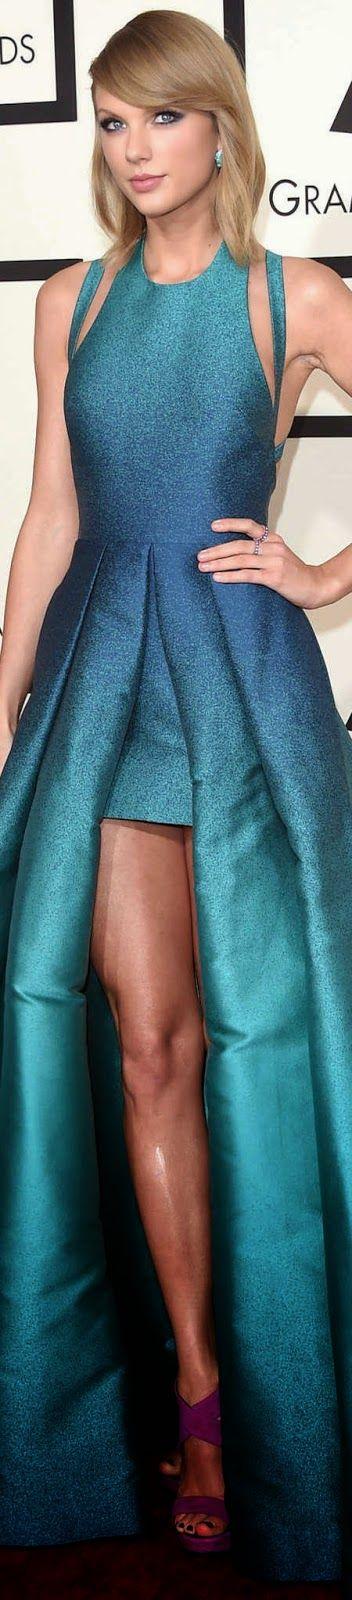 Taylor Swift 2015 Grammy Red Carpet Fashion